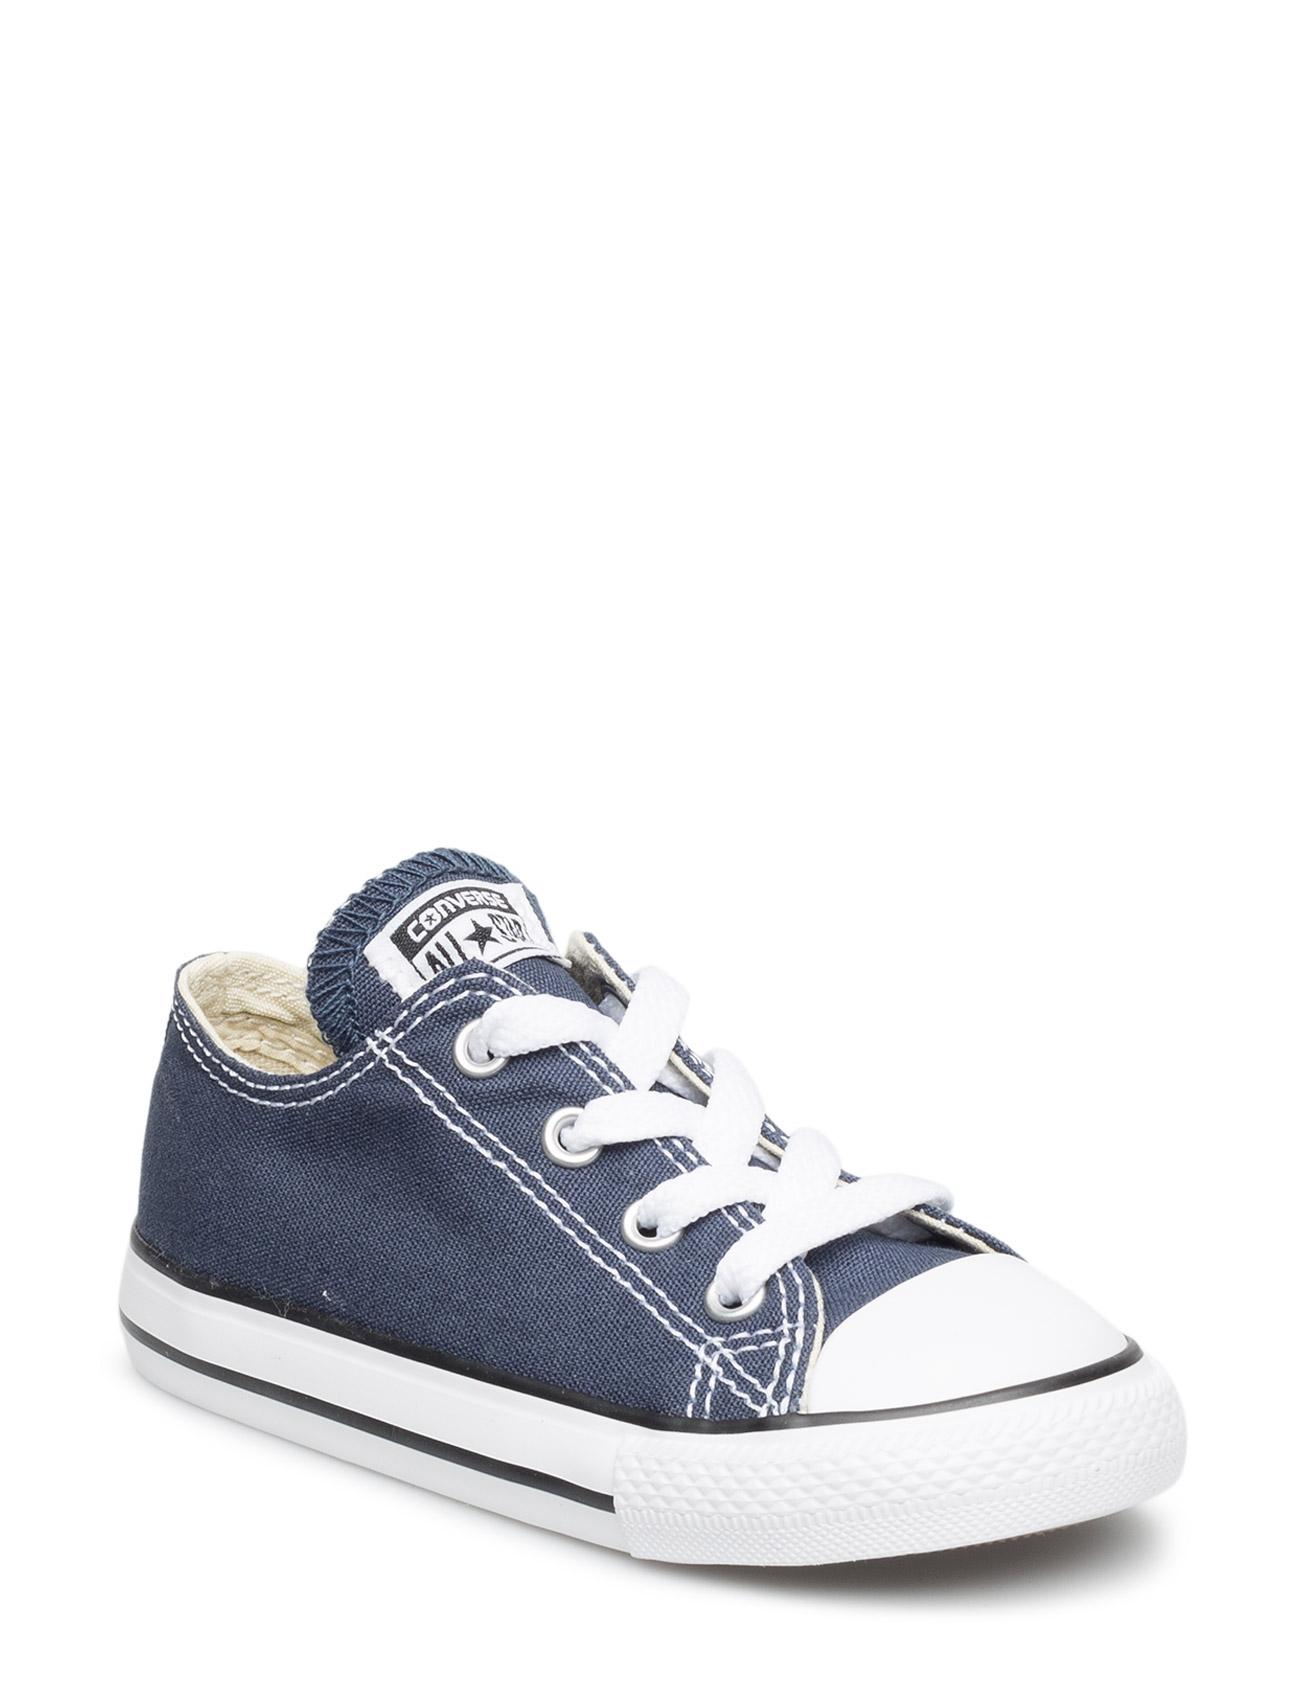 Chuck Taylor All Star Converse Sko & Sneakers til Børn i Navy blå